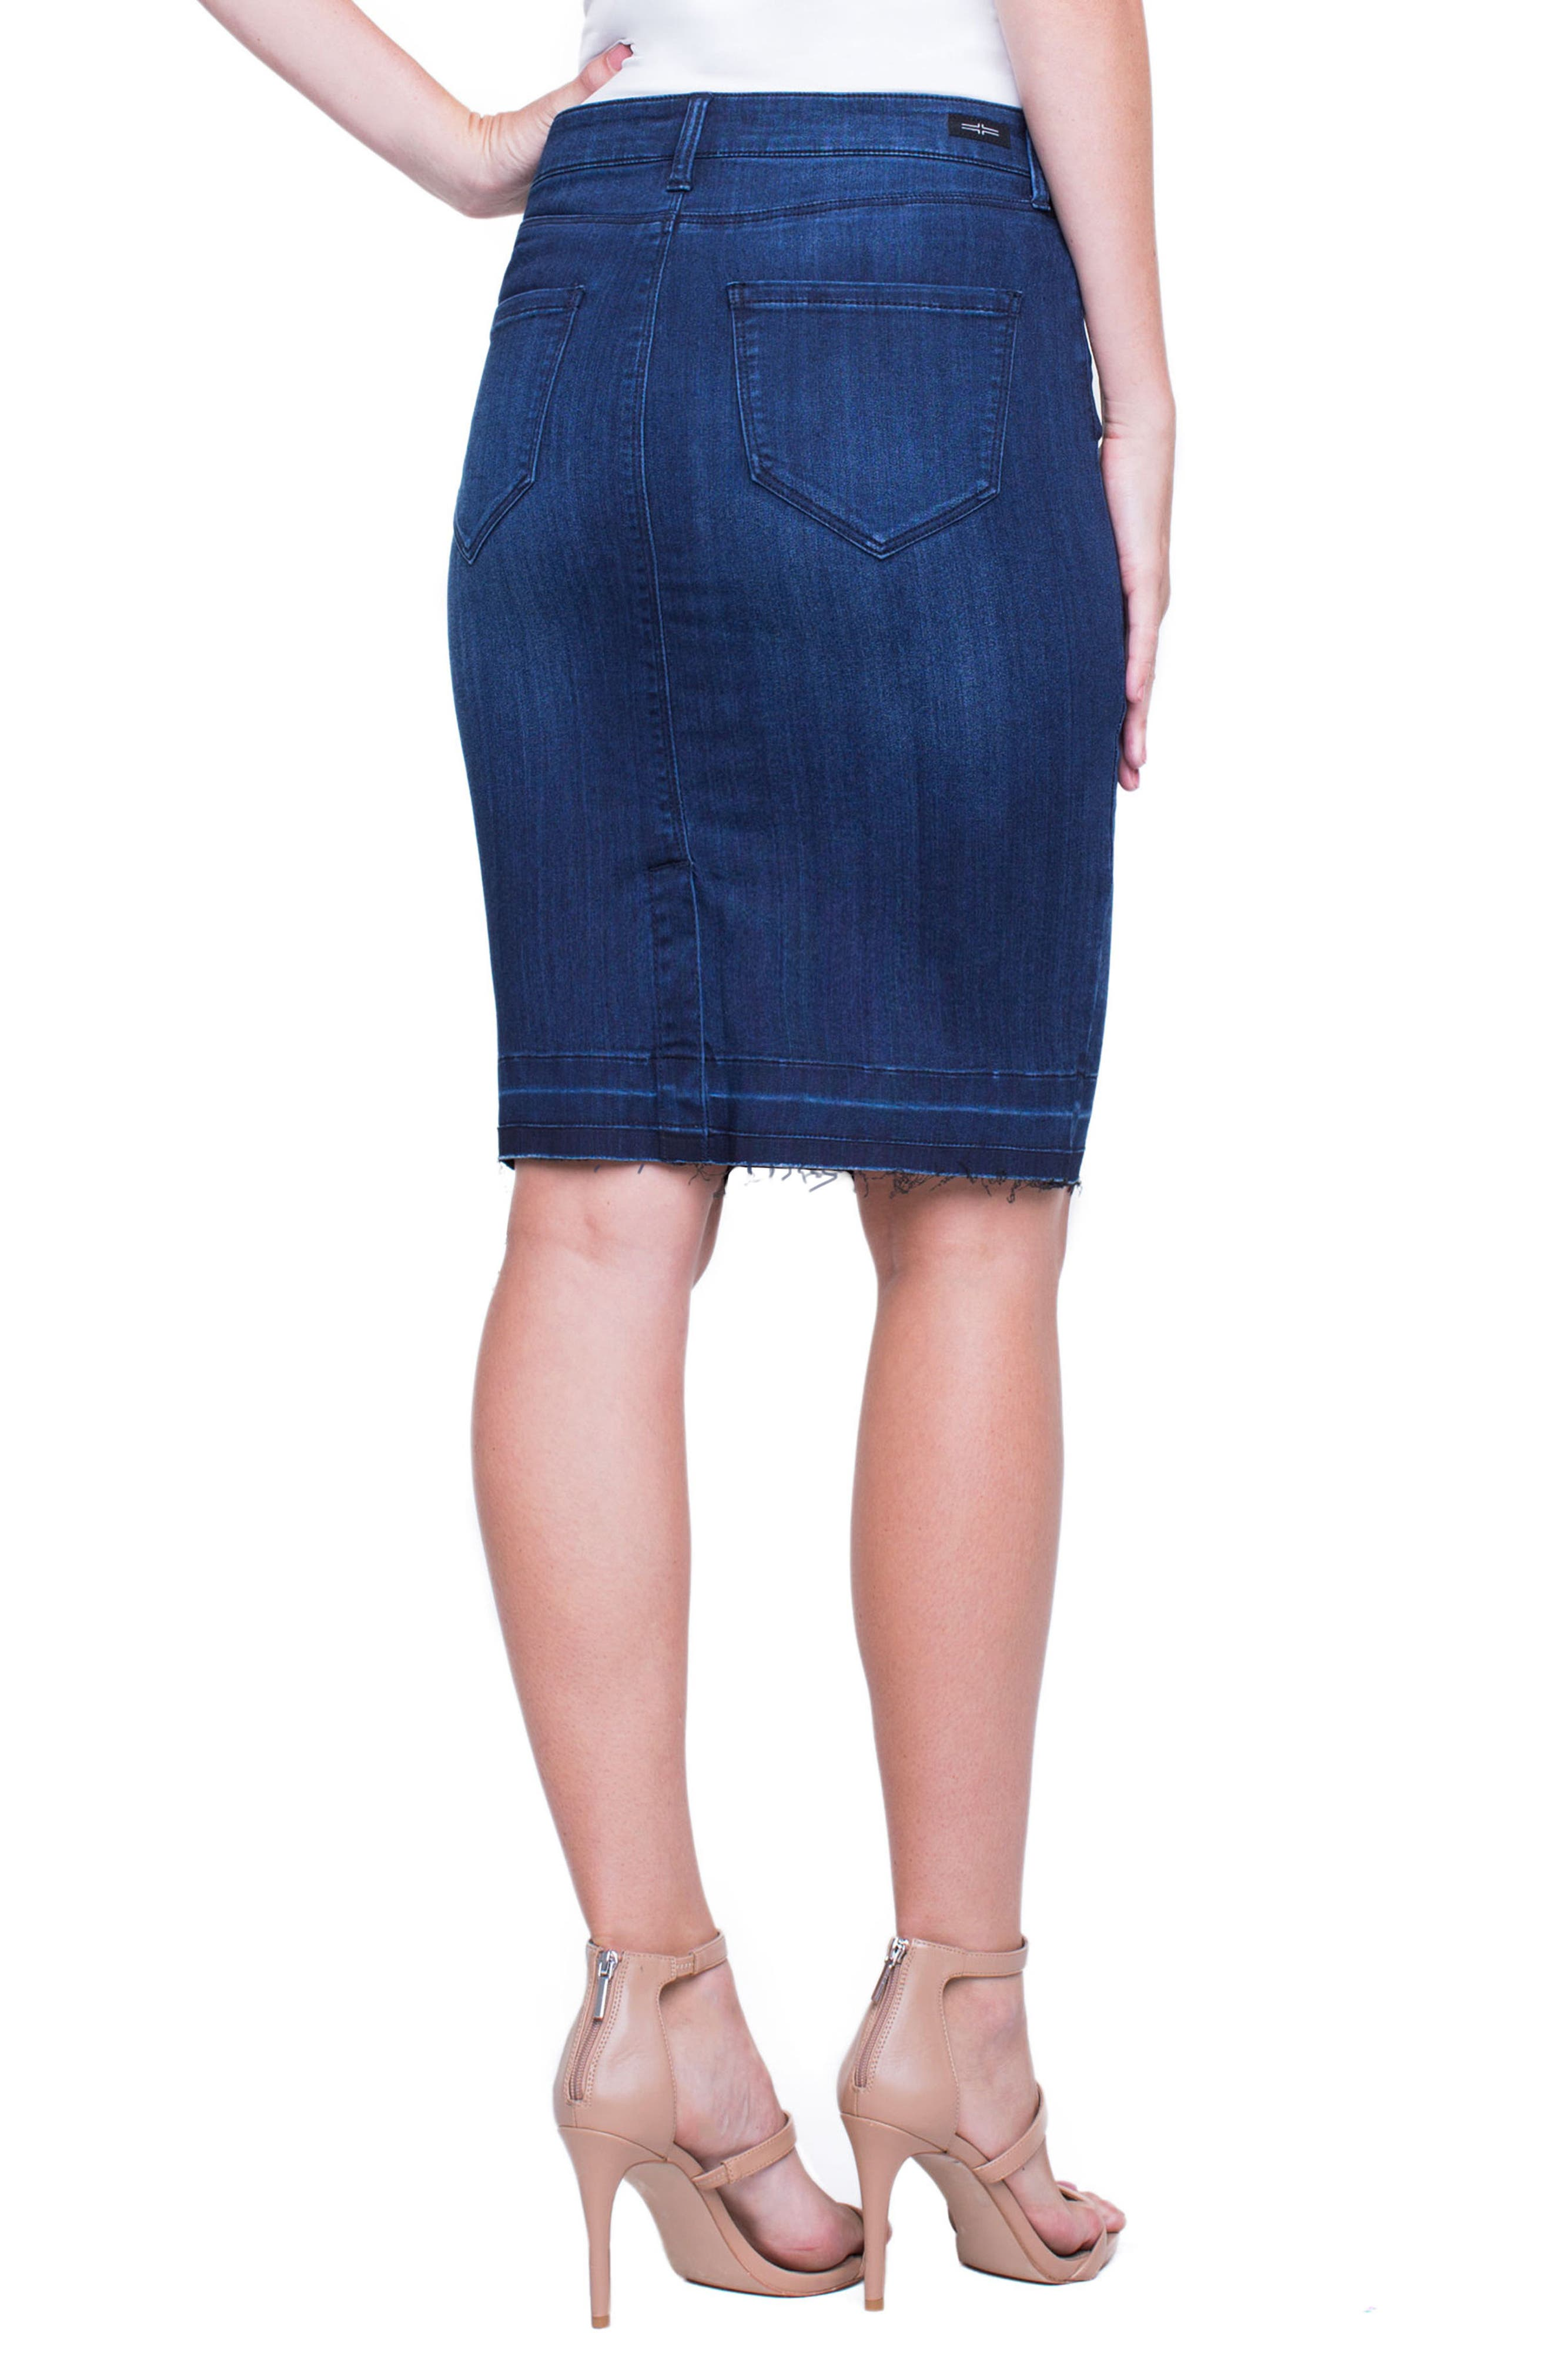 Alternate Image 3  - Liverpool Jeans Company Denim Pencil Skirt (Estrella Med Dark)